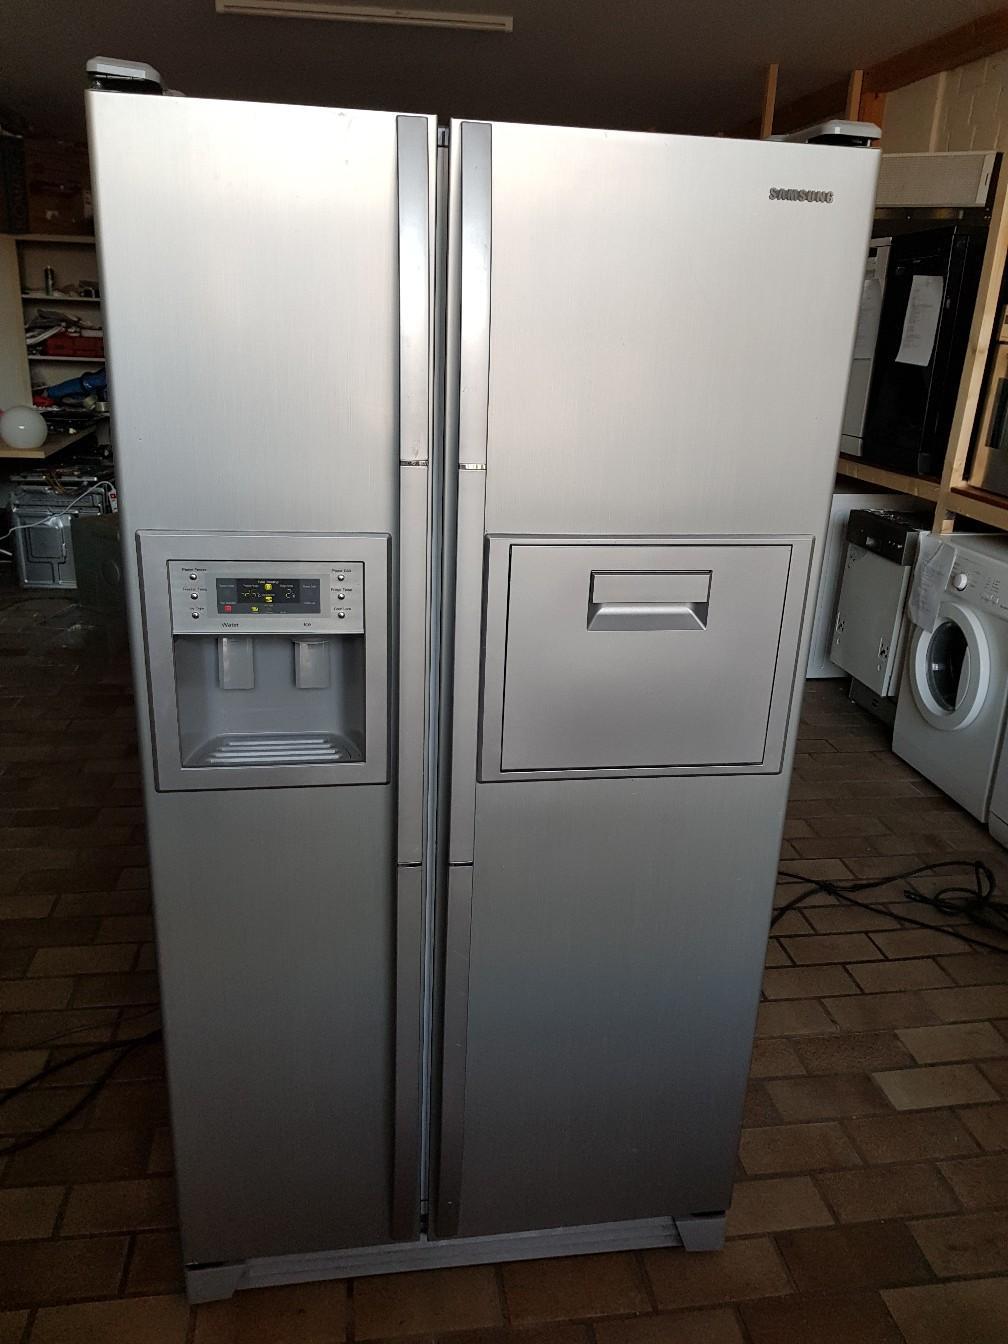 Side By Side Kühlschrank Black Friday : Gebraucht side by side kühlschrank in krefeld um u ac